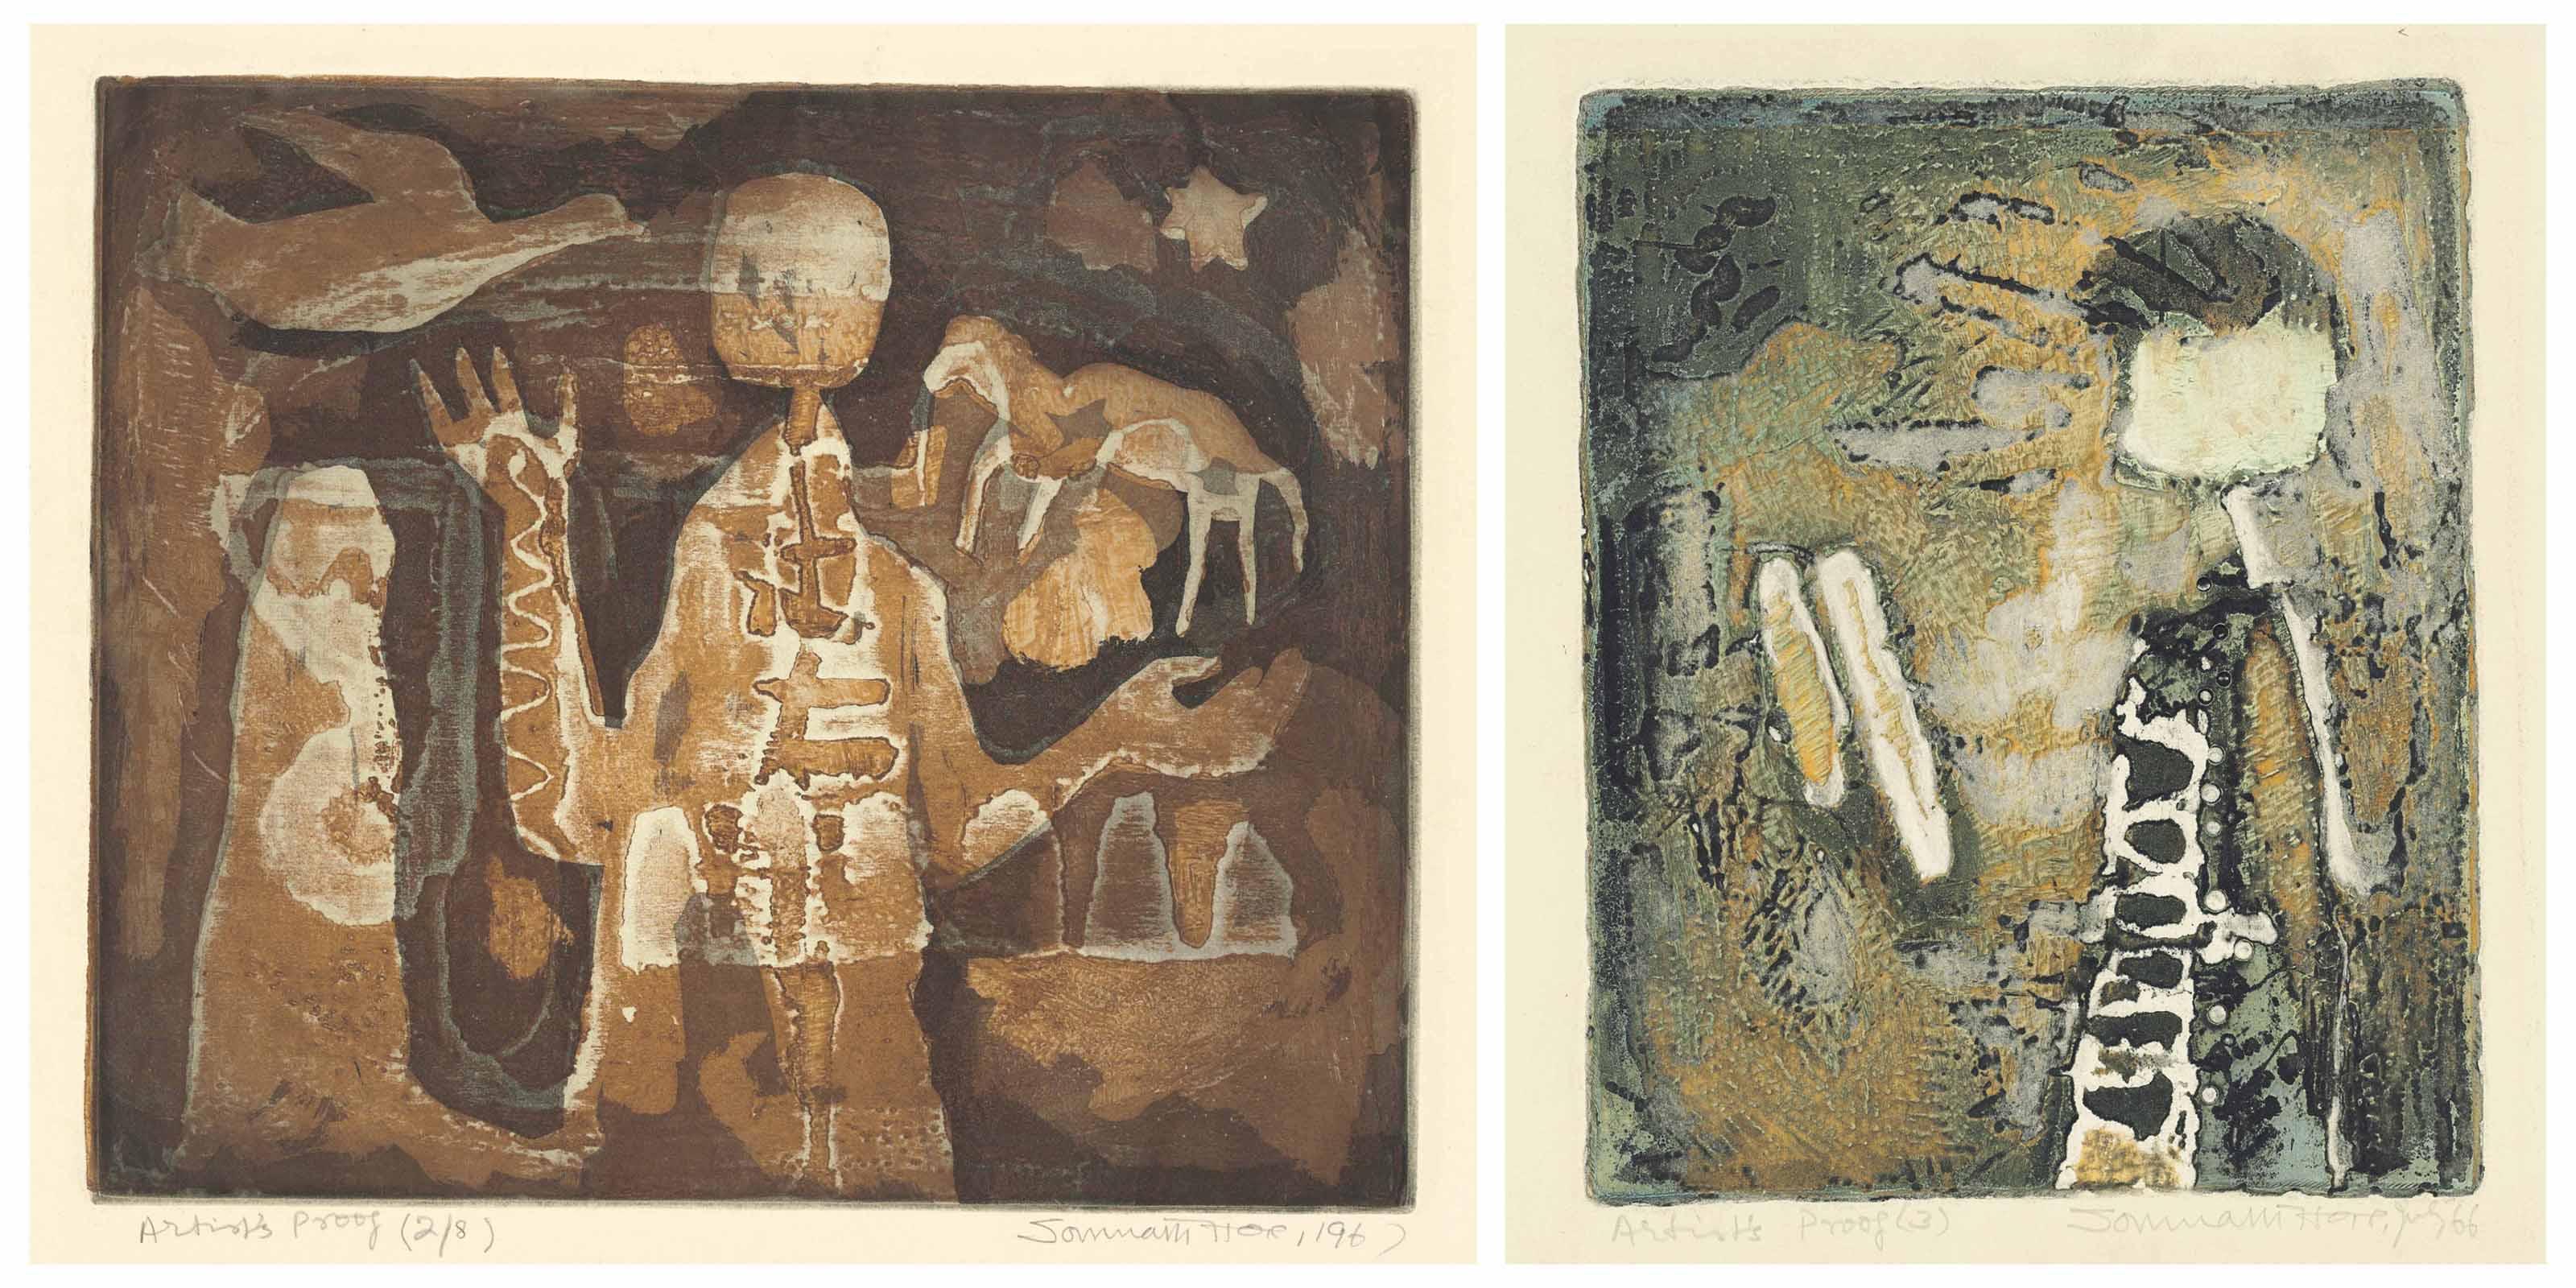 SOMNATH HORE (1921-2006)